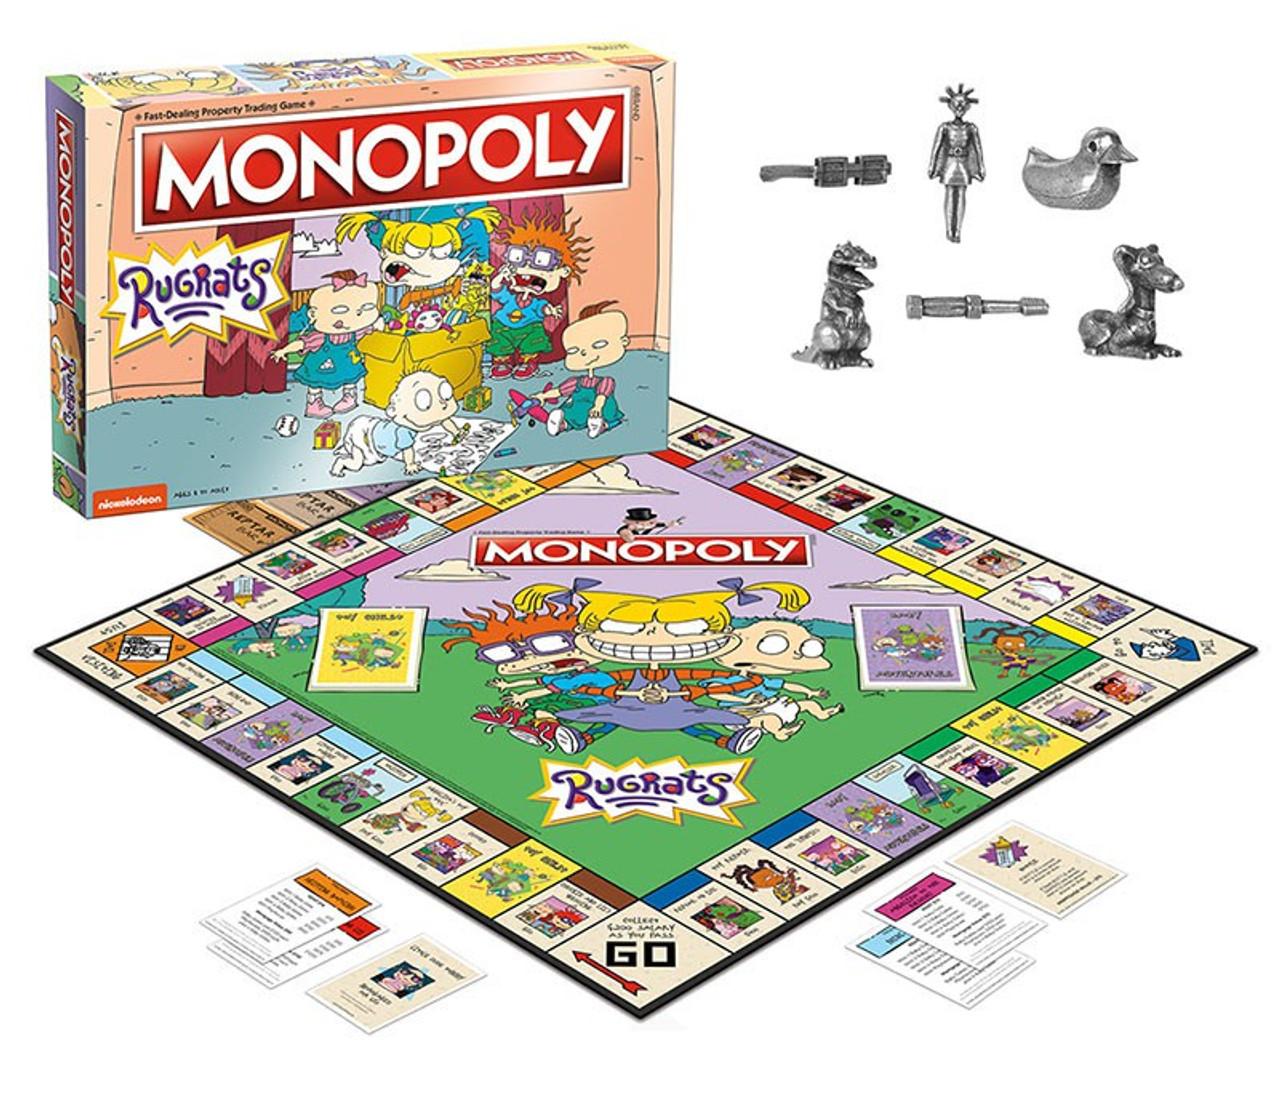 Картинки по запросу Boardgames - Monopoly - Rugrats